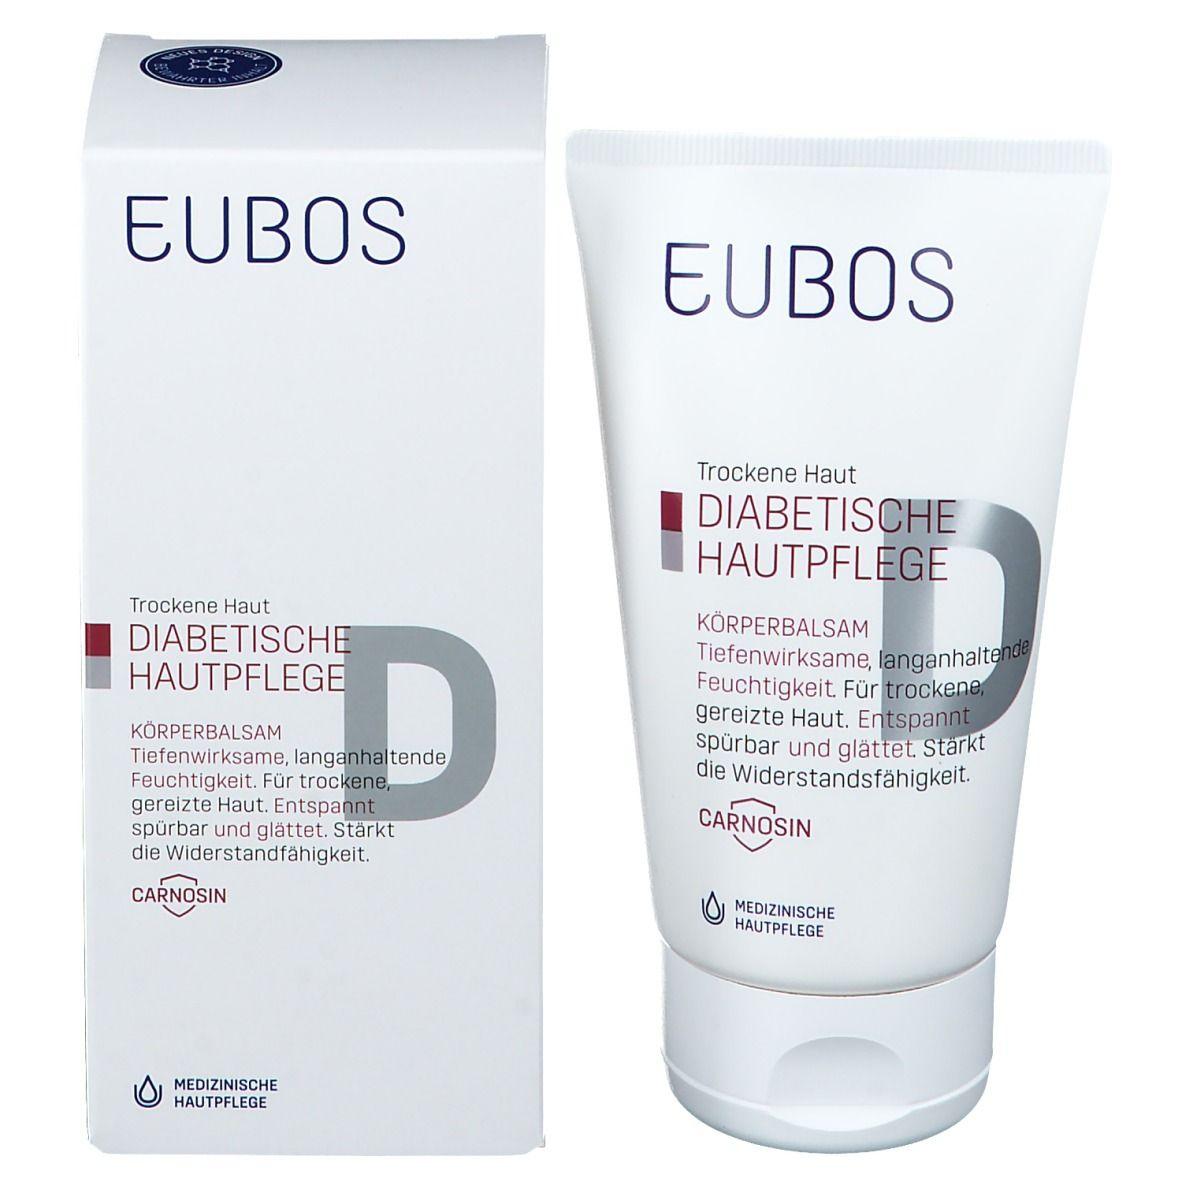 EUBOS® DIABETES HAUT SPEZIAL Körperbalsam Anti Xerosis